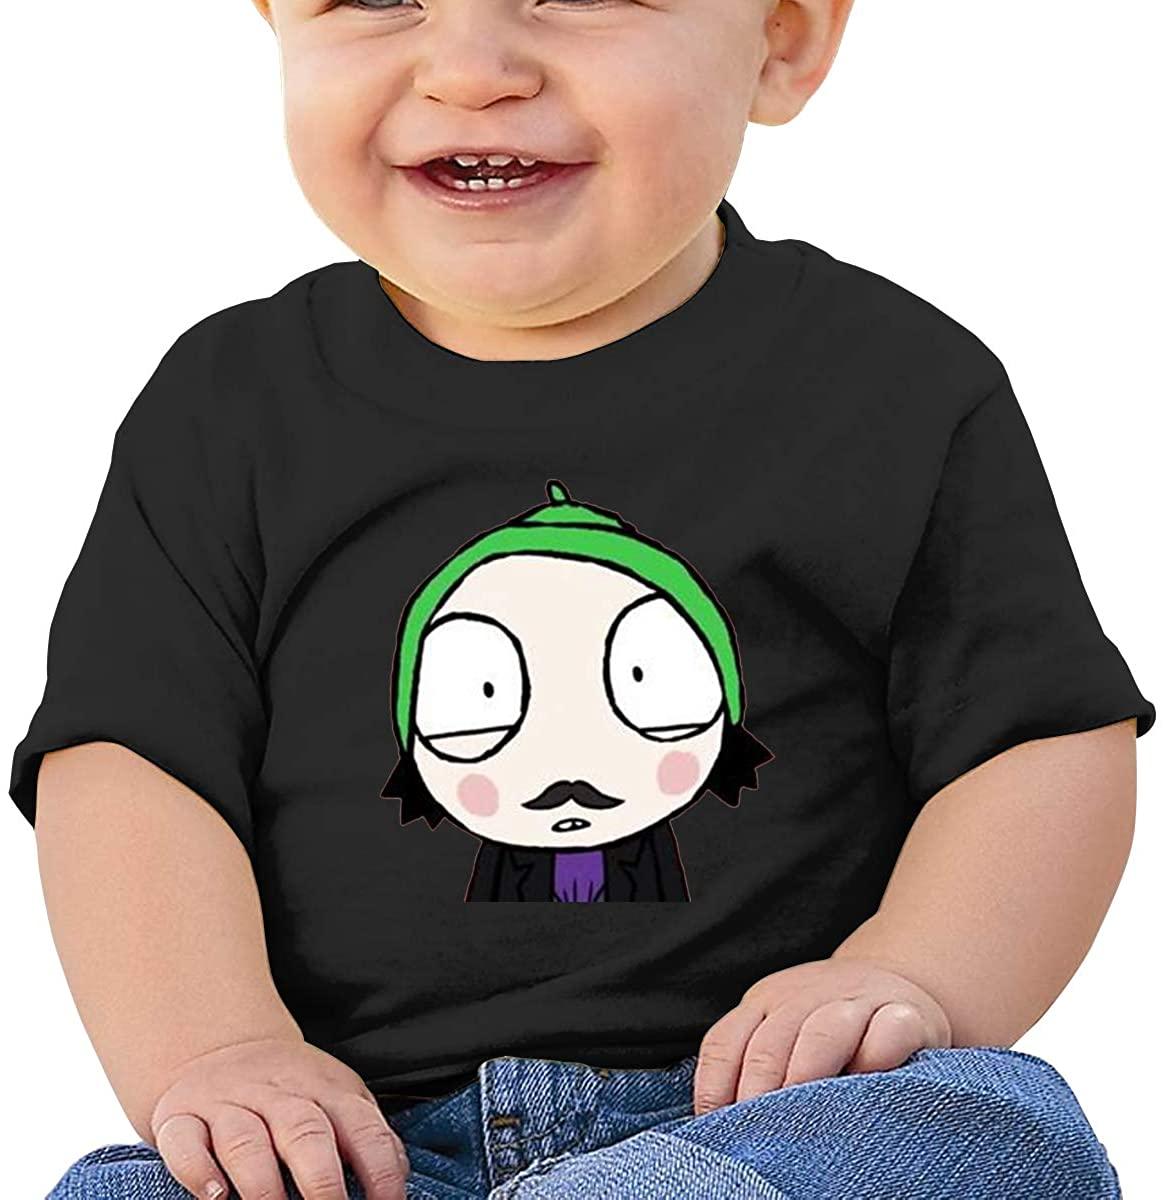 6-24 Months Boy and Girl Baby Short Sleeve T-Shirt Sarah & Duck Logo Original Minimalist Style Black